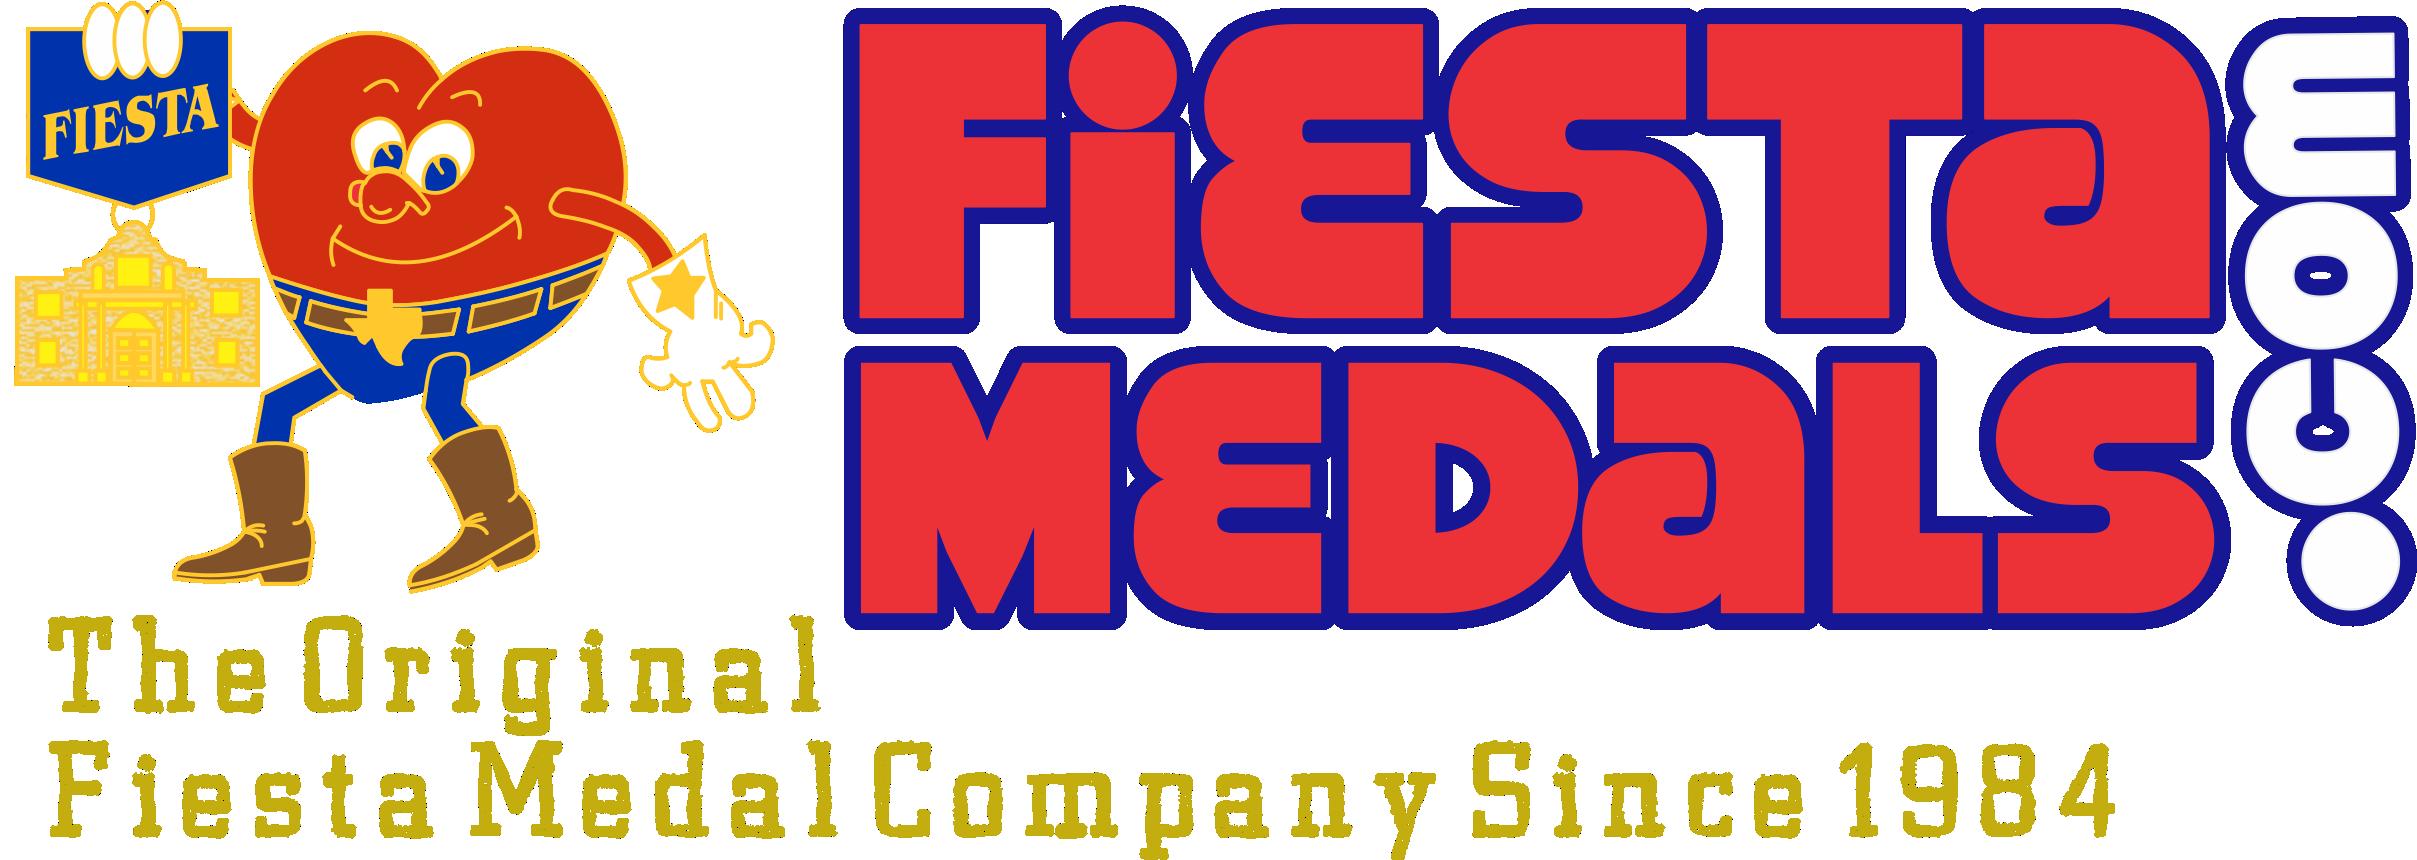 FiestaMedals.com The Original Fiesta Medal Company Since 1984